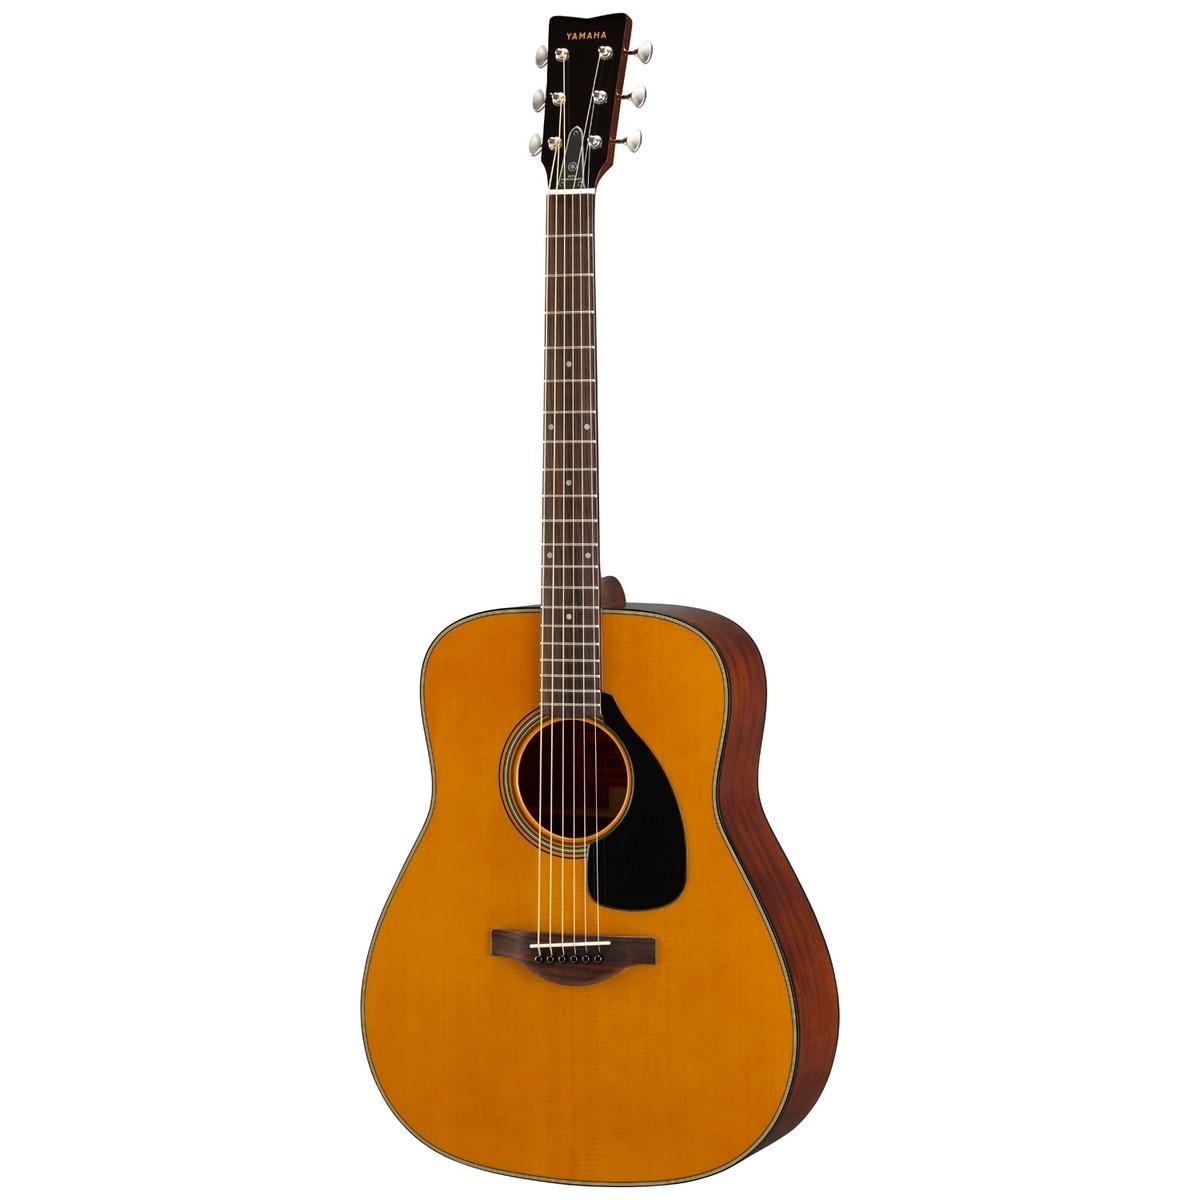 yamaha fg180 50 anniversary model acoustic guitar natural. Black Bedroom Furniture Sets. Home Design Ideas